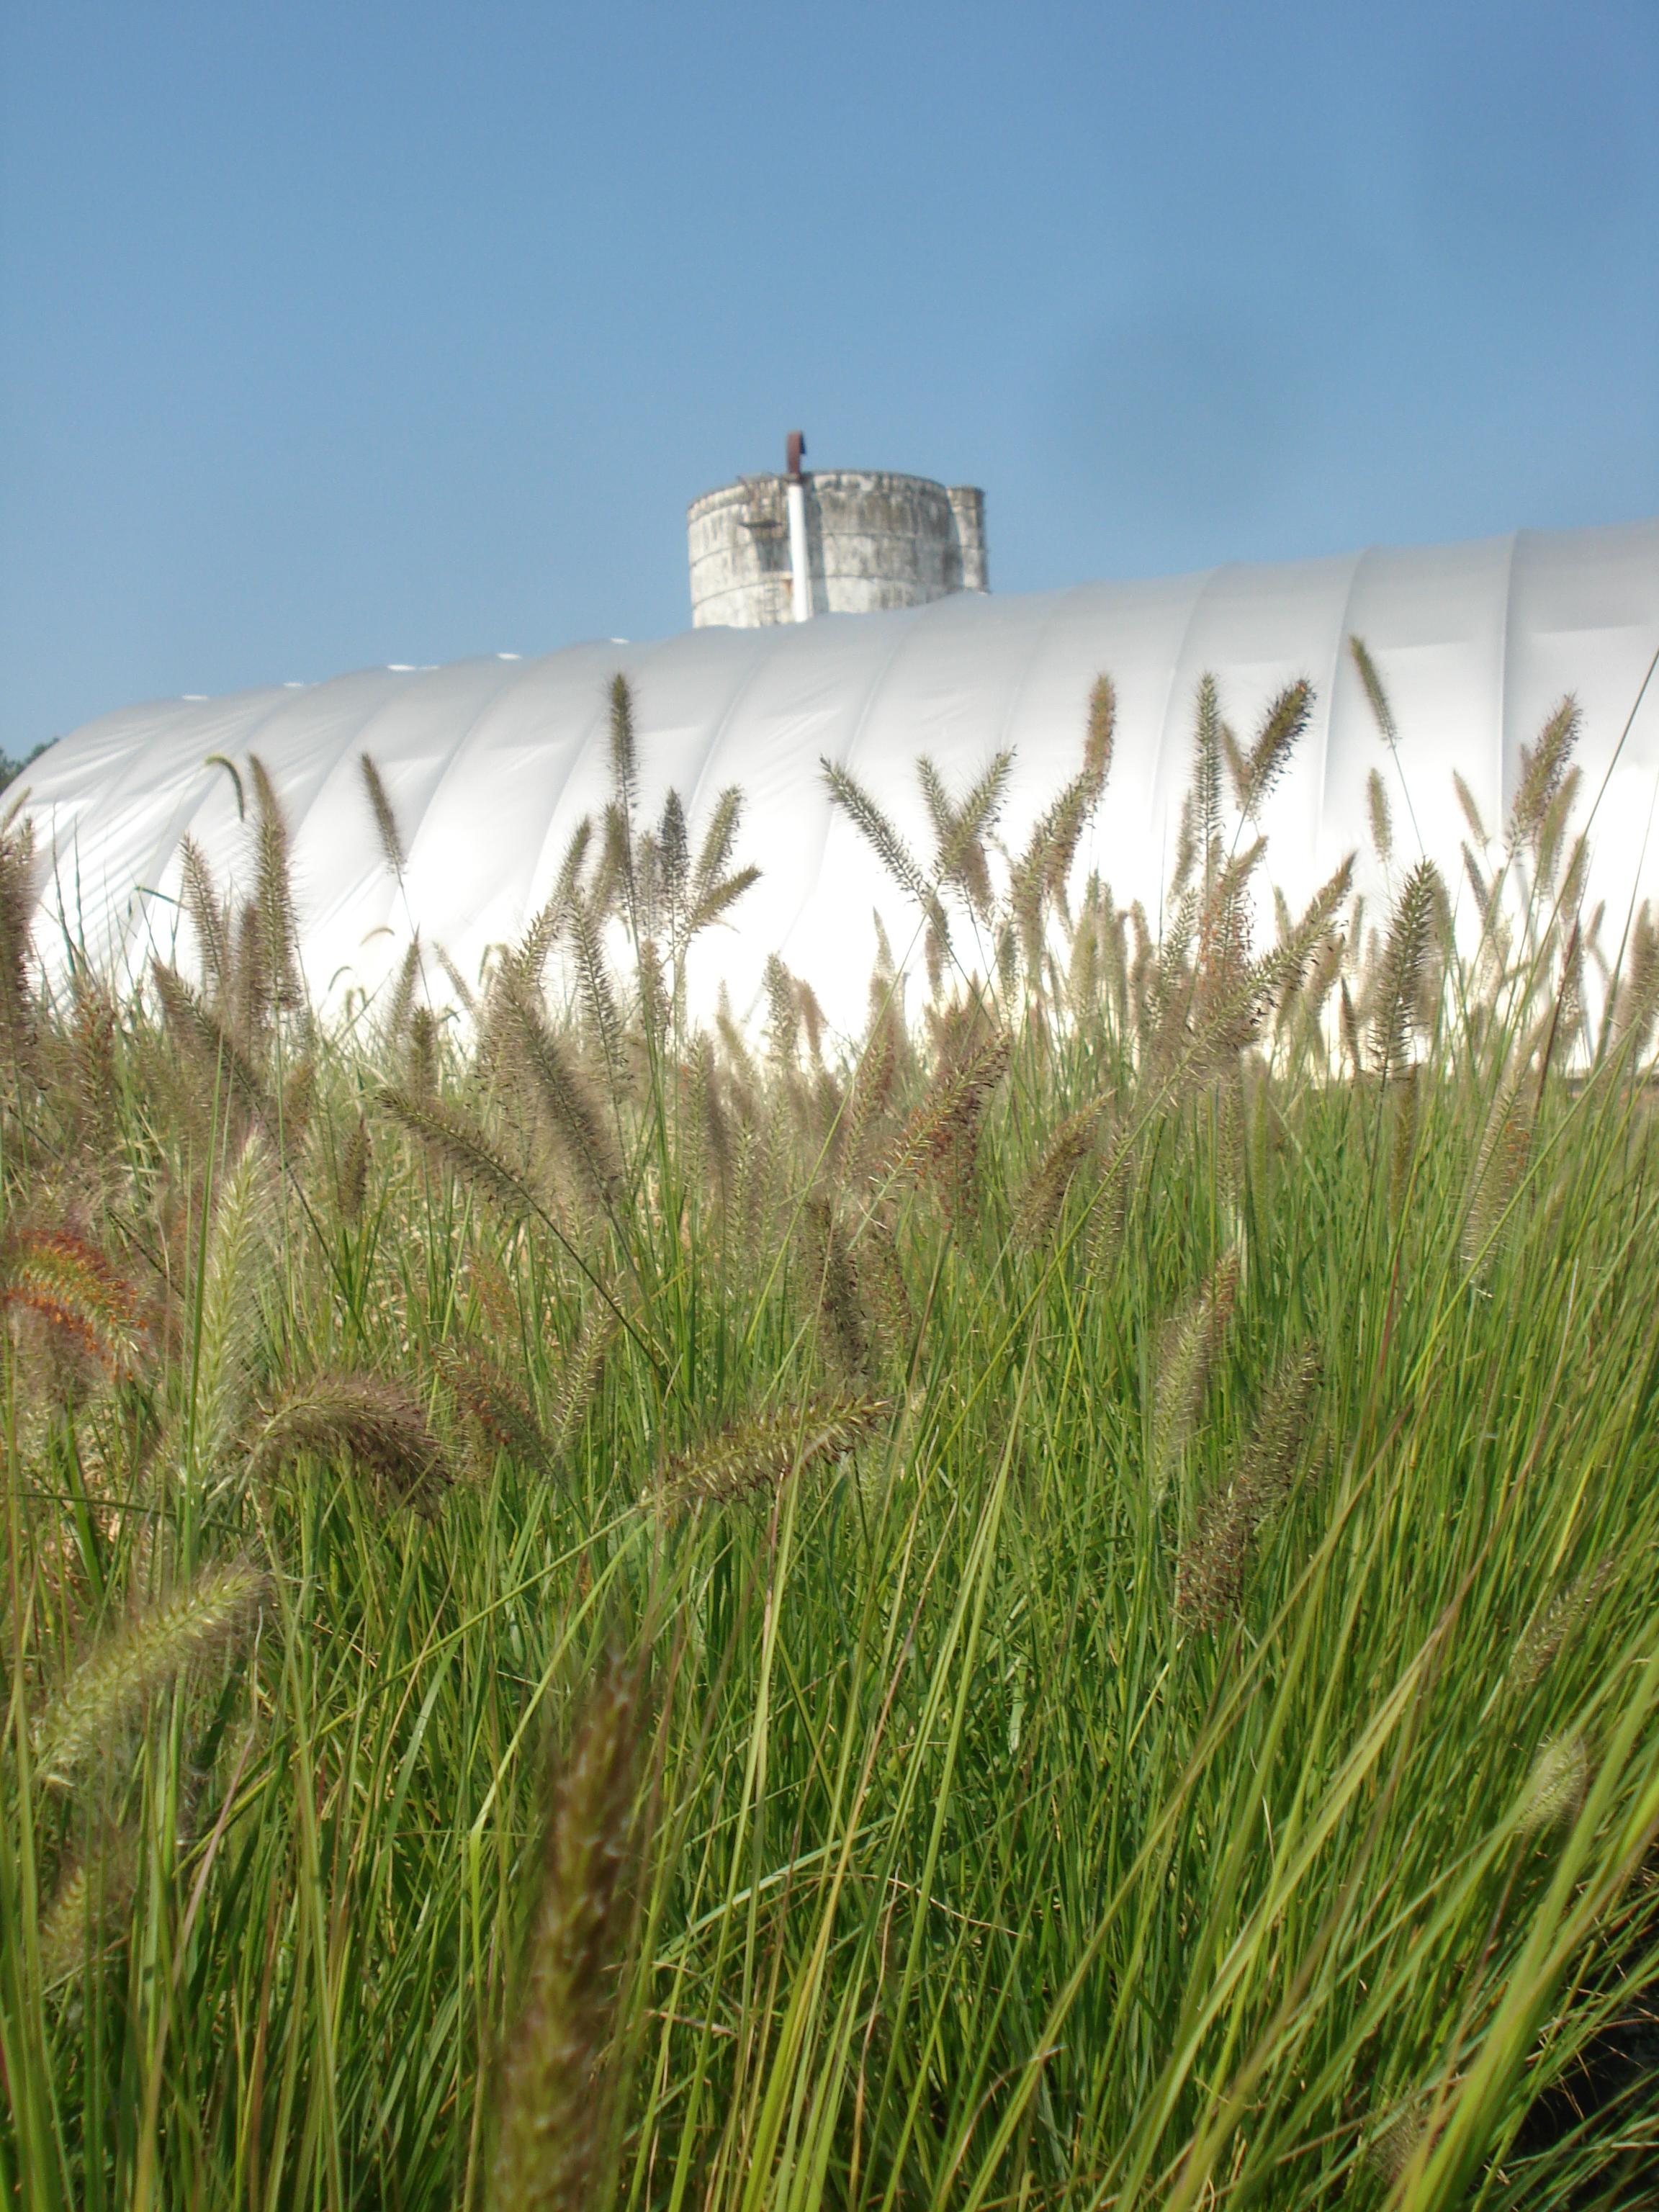 Grass with silo.JPG